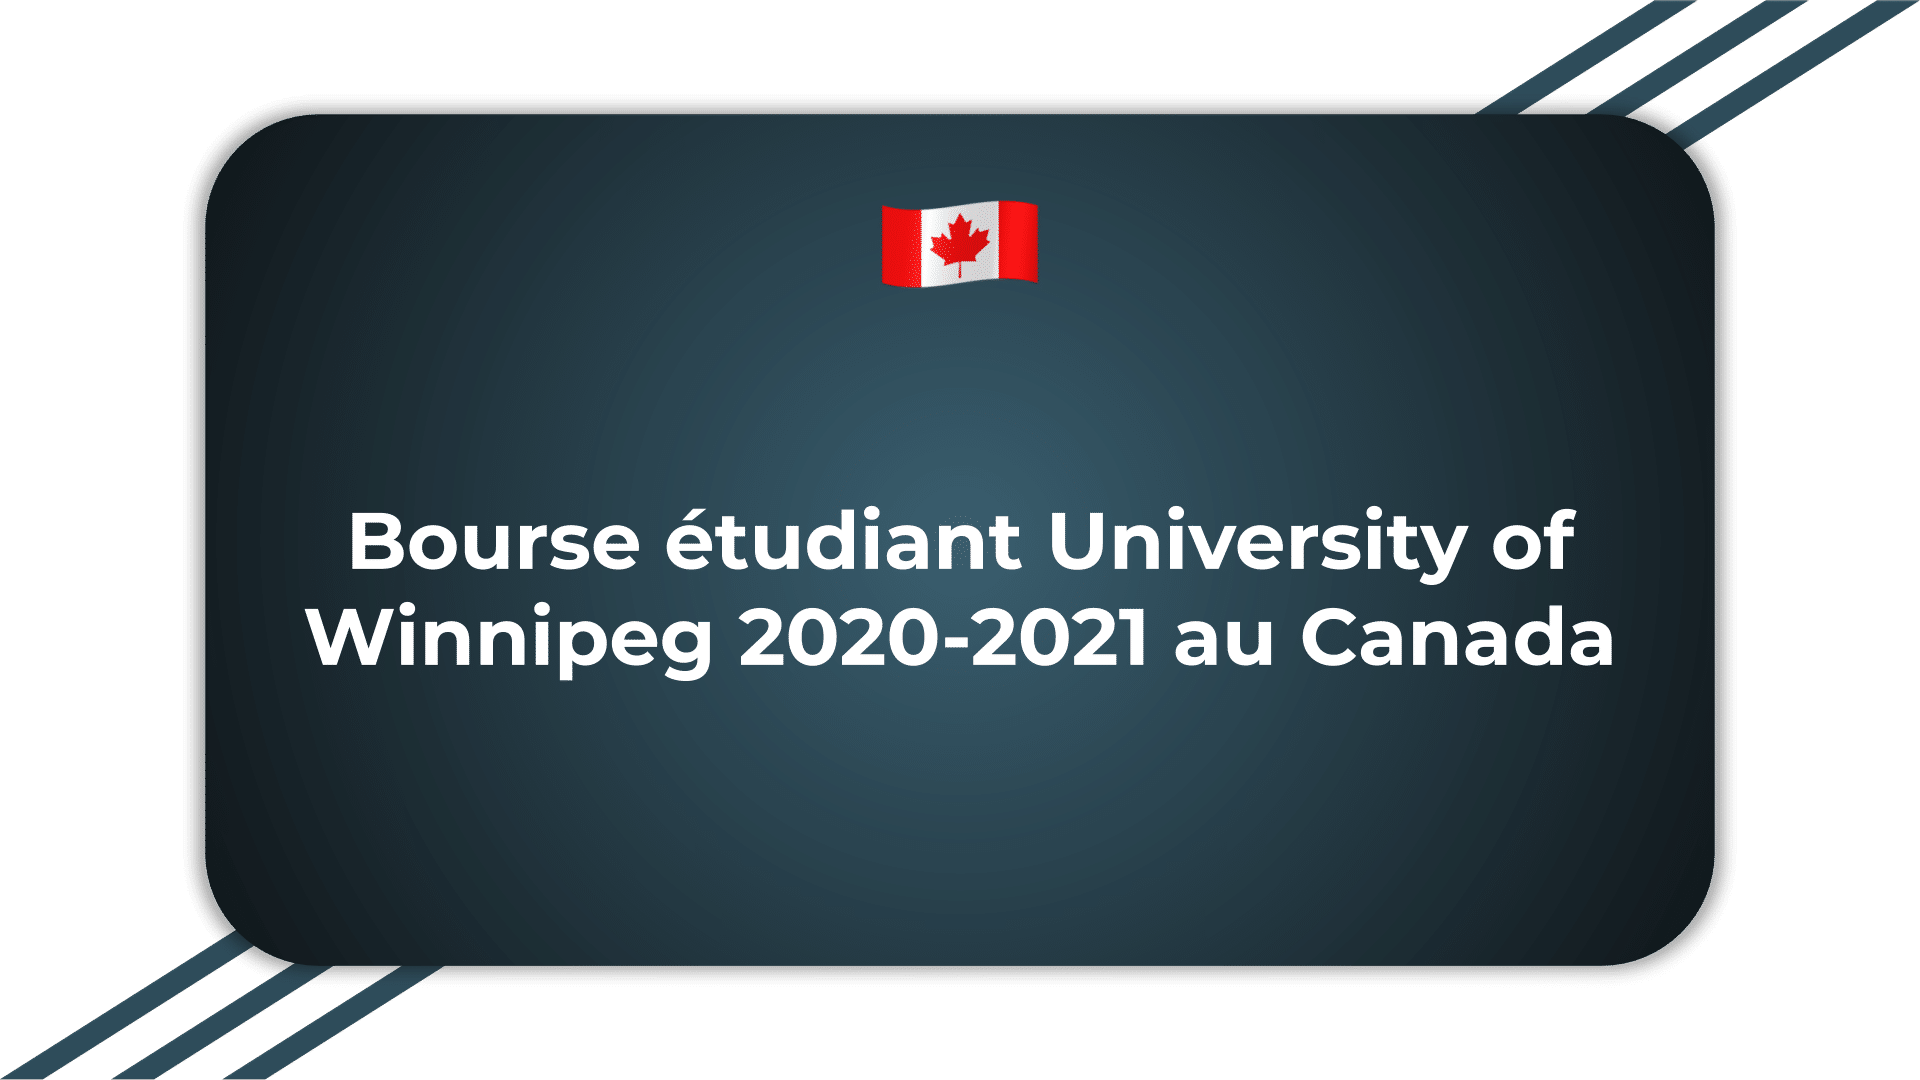 Bourse étudiant University of Winnipeg